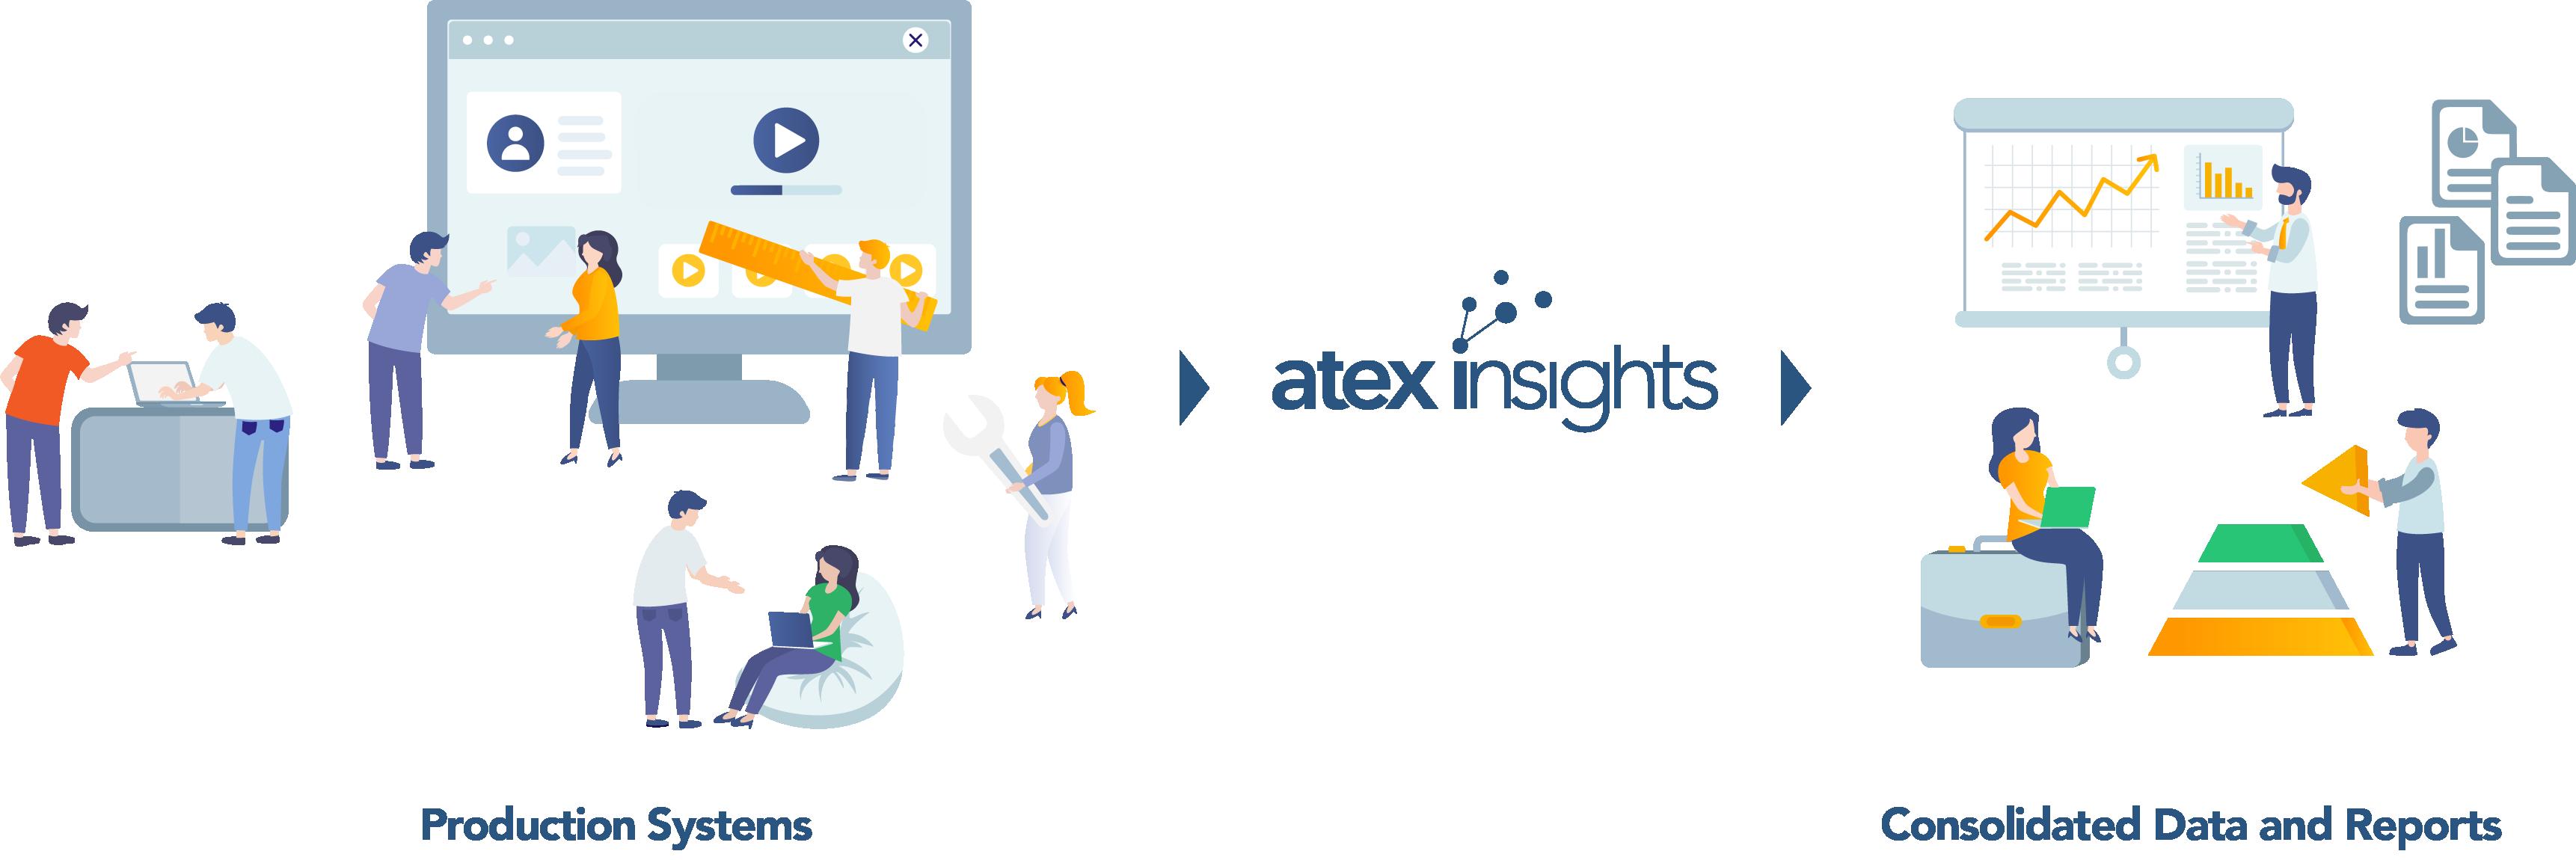 insights workflow